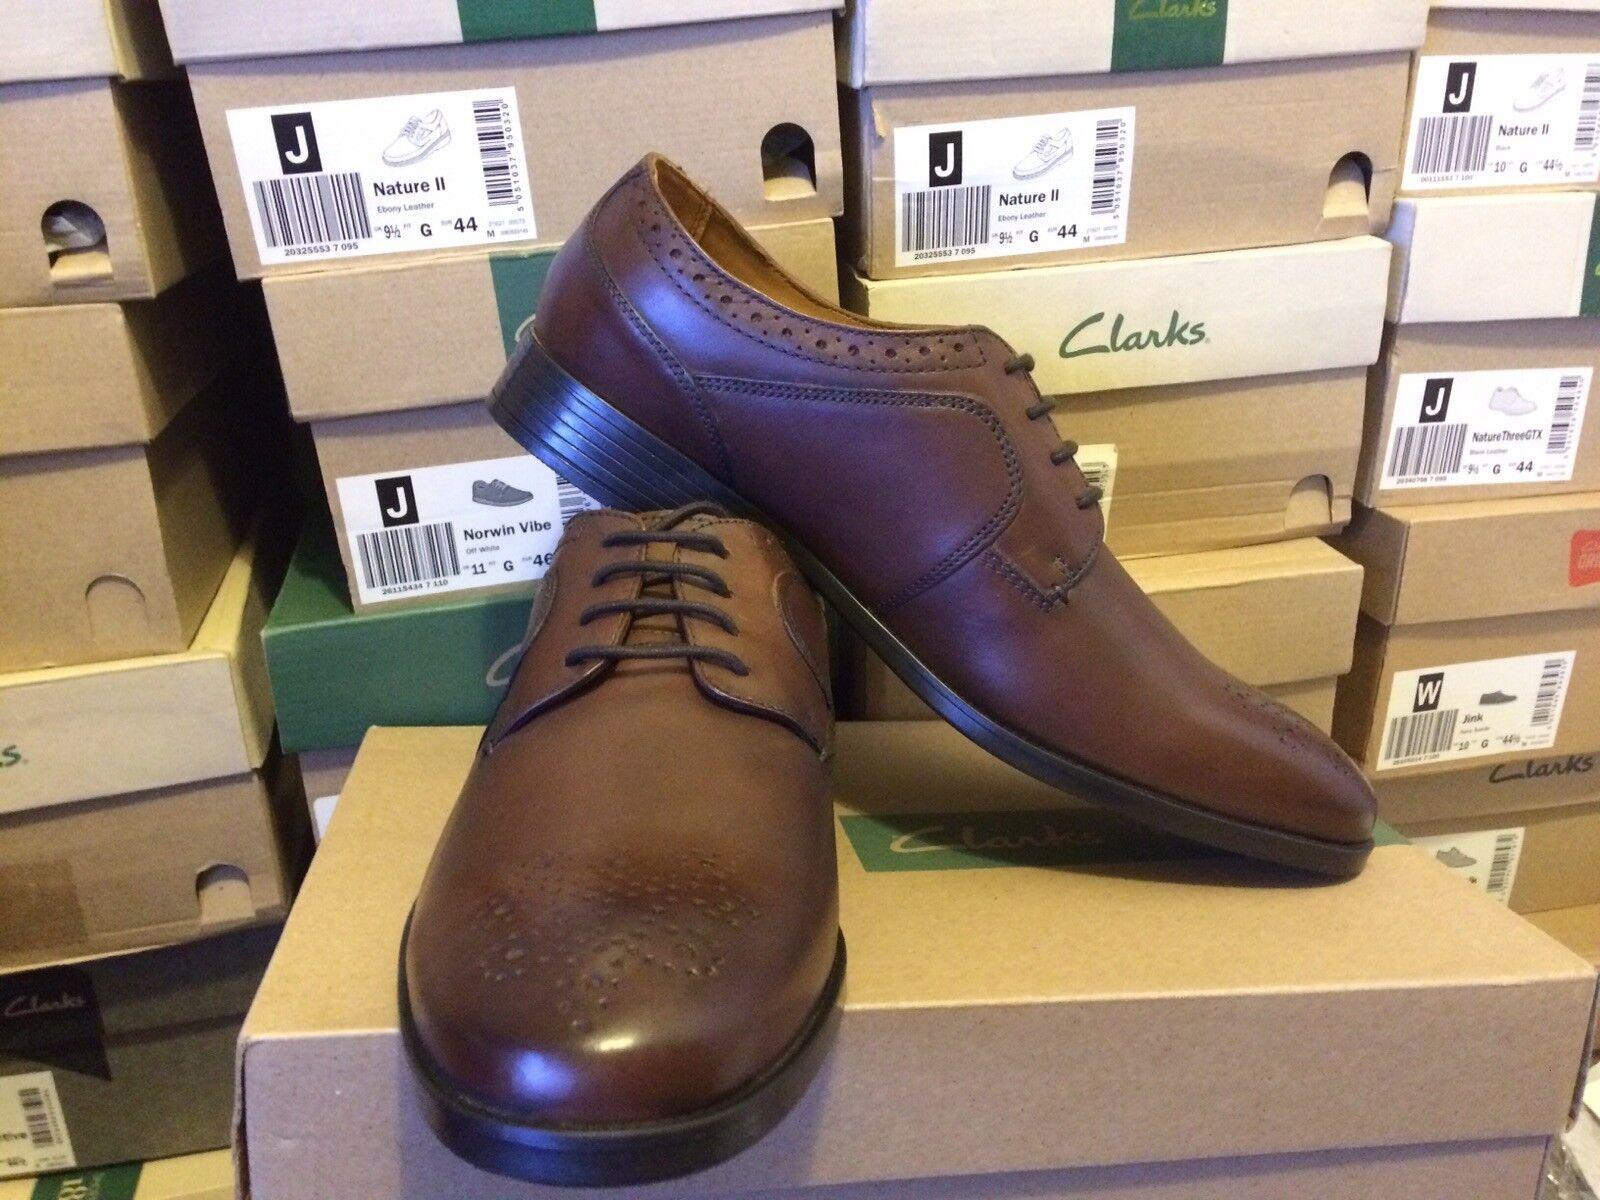 Clarks Kalden Edge Men's Brown Leather shoes Uk Size 8,5G.